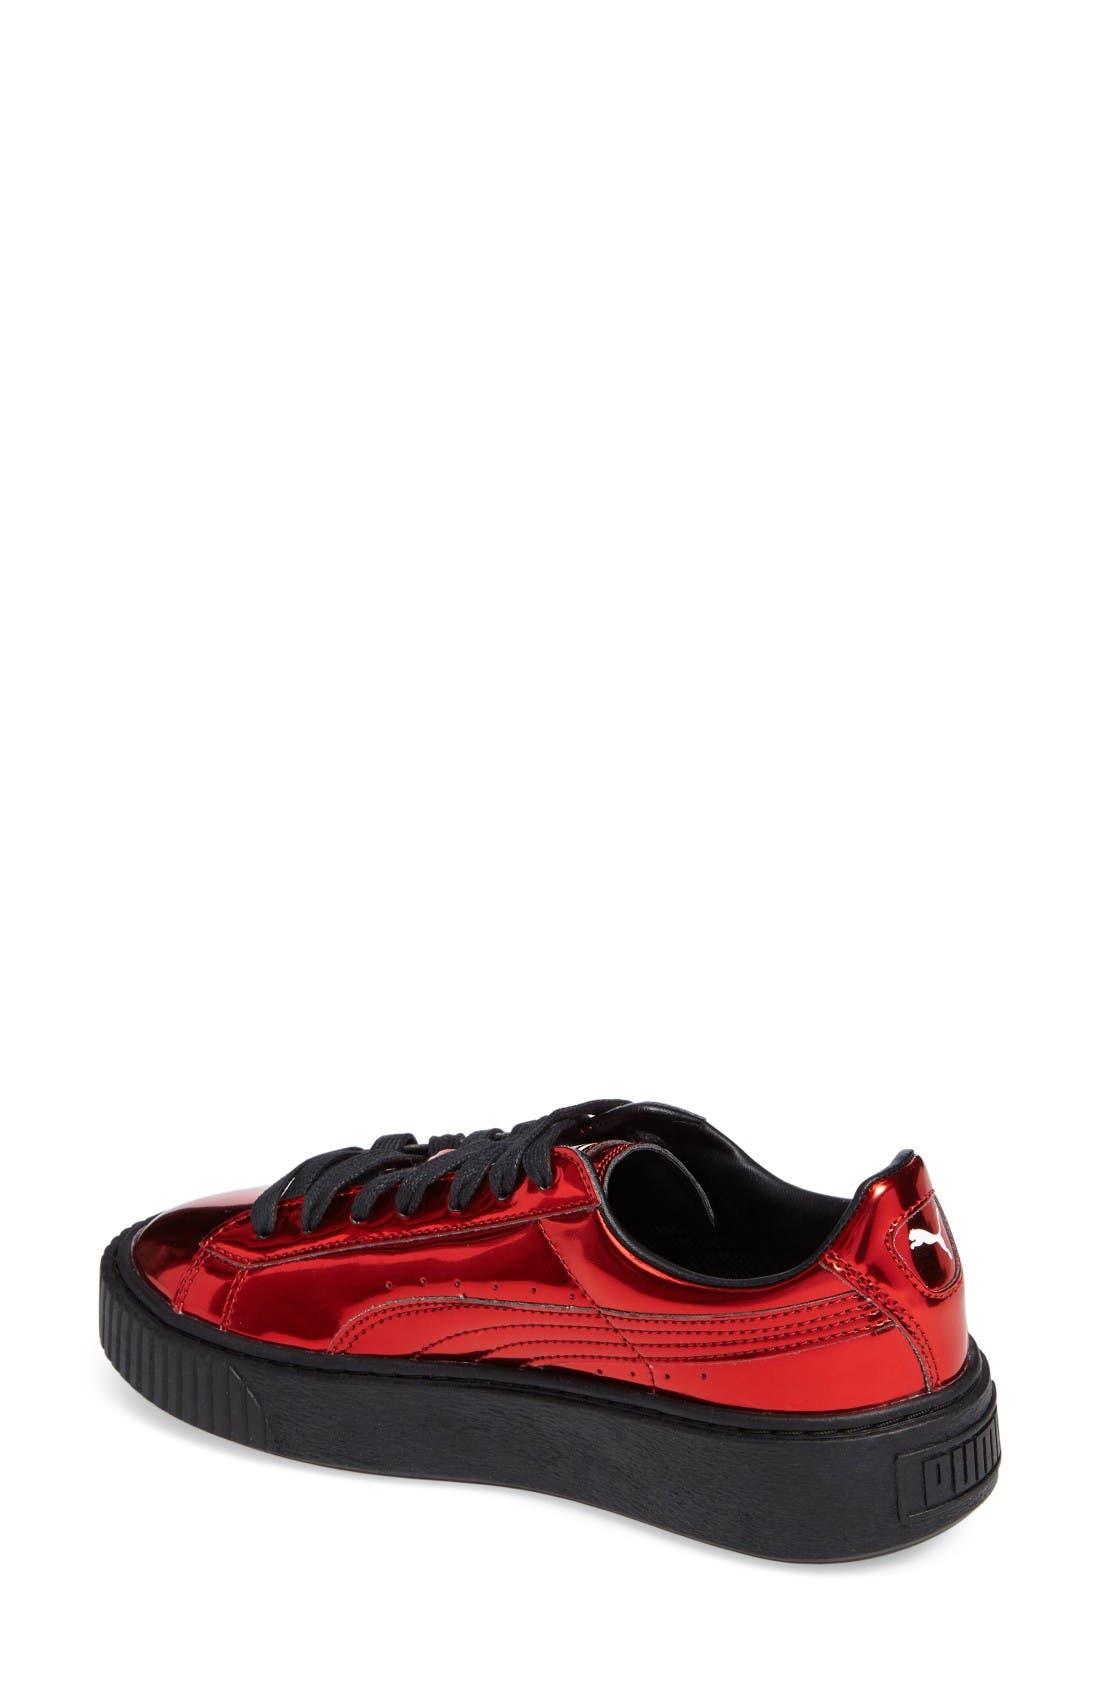 Alternate Image 2  - PUMA Platform Sneaker (Women)